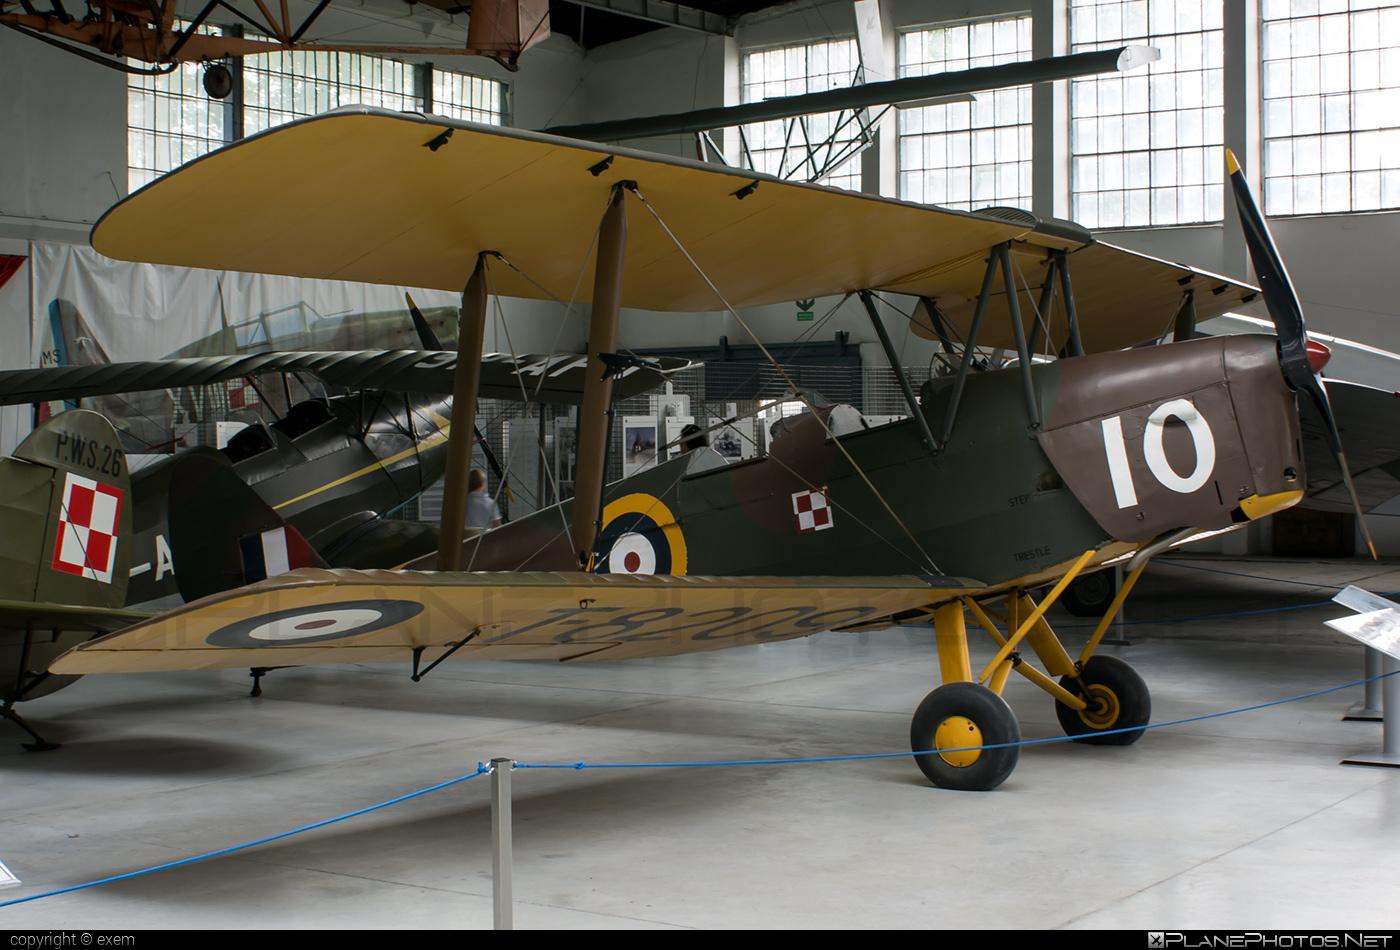 De Havilland Tiger Moth Mk.II - T-8209 operated by Royal Air Force (RAF) #dehavilland #raf #royalairforce